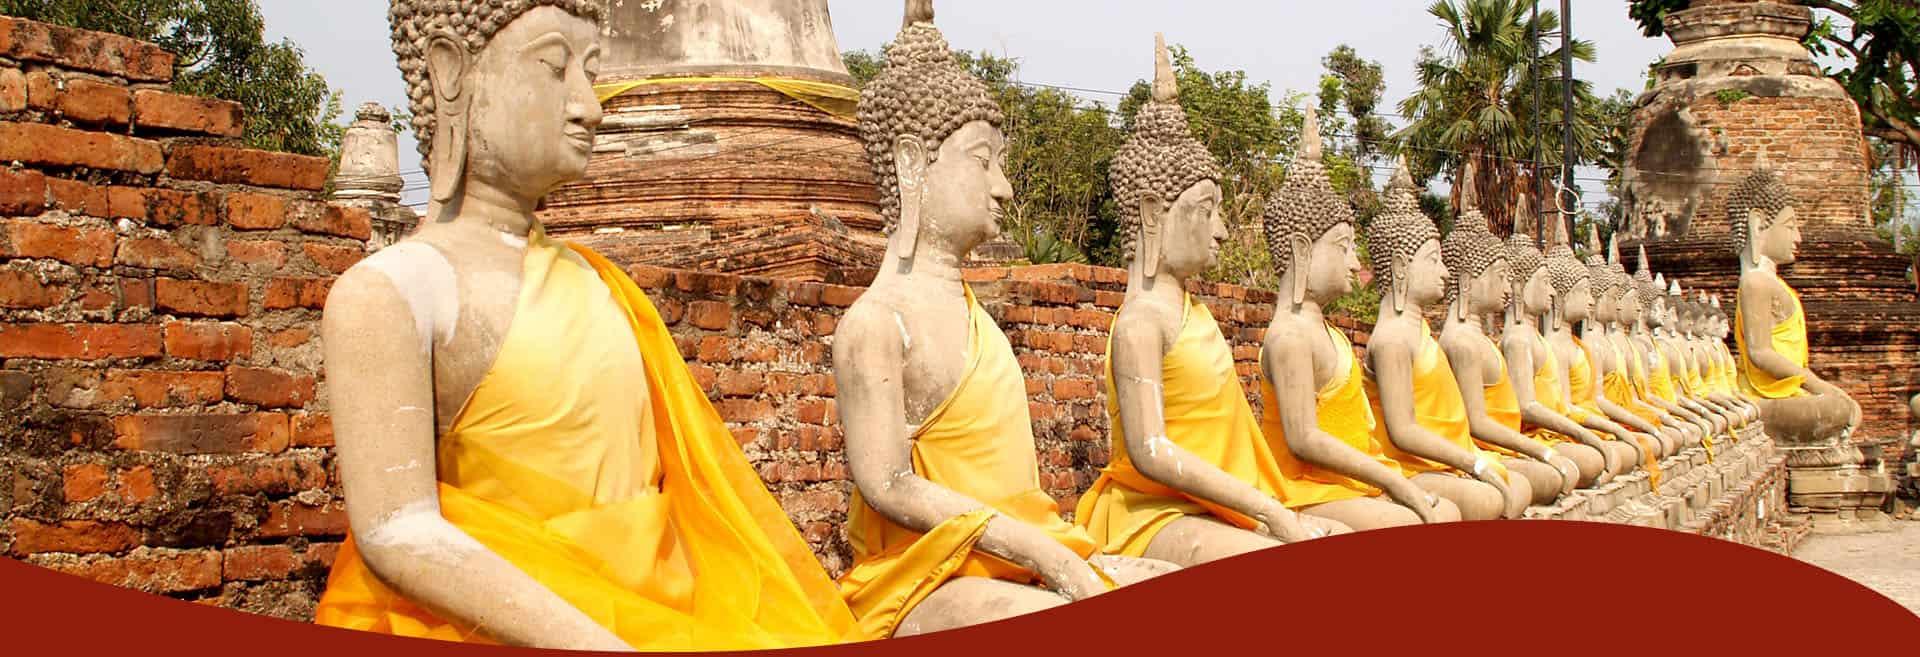 Buddha szobrok